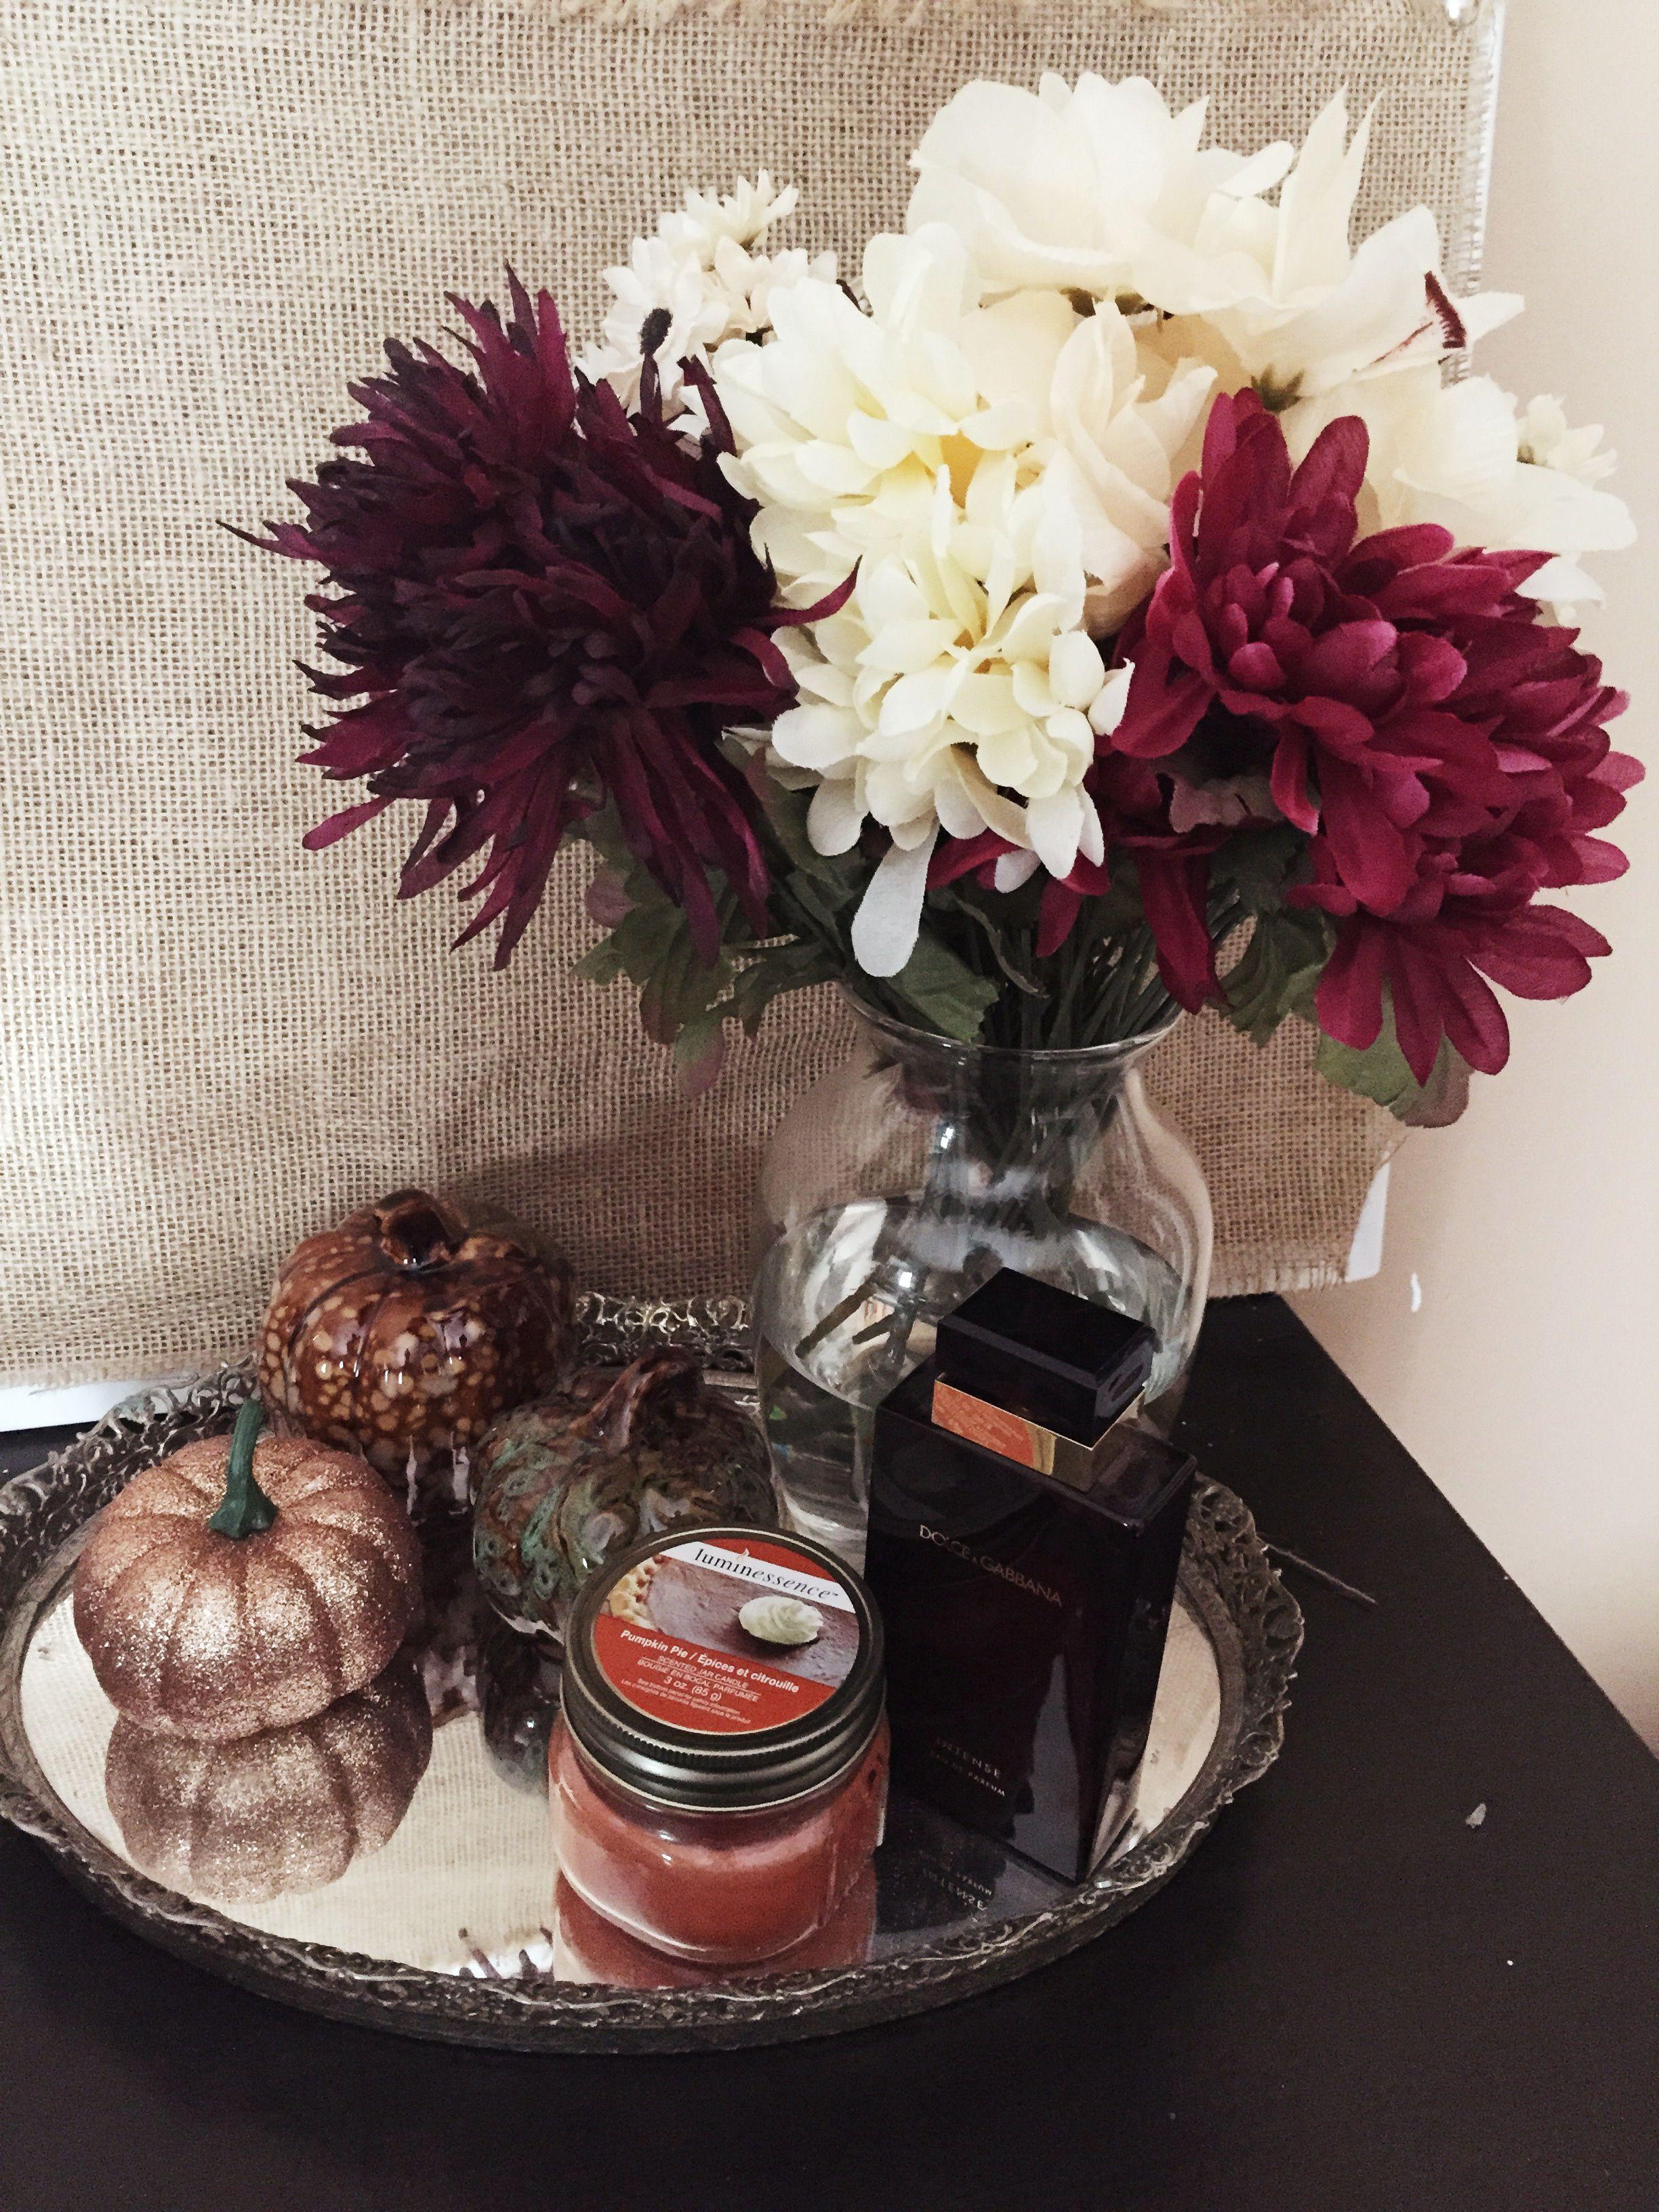 Styling Dollar Tree Fall Decorations My fall fake flower arrangement I diyed…